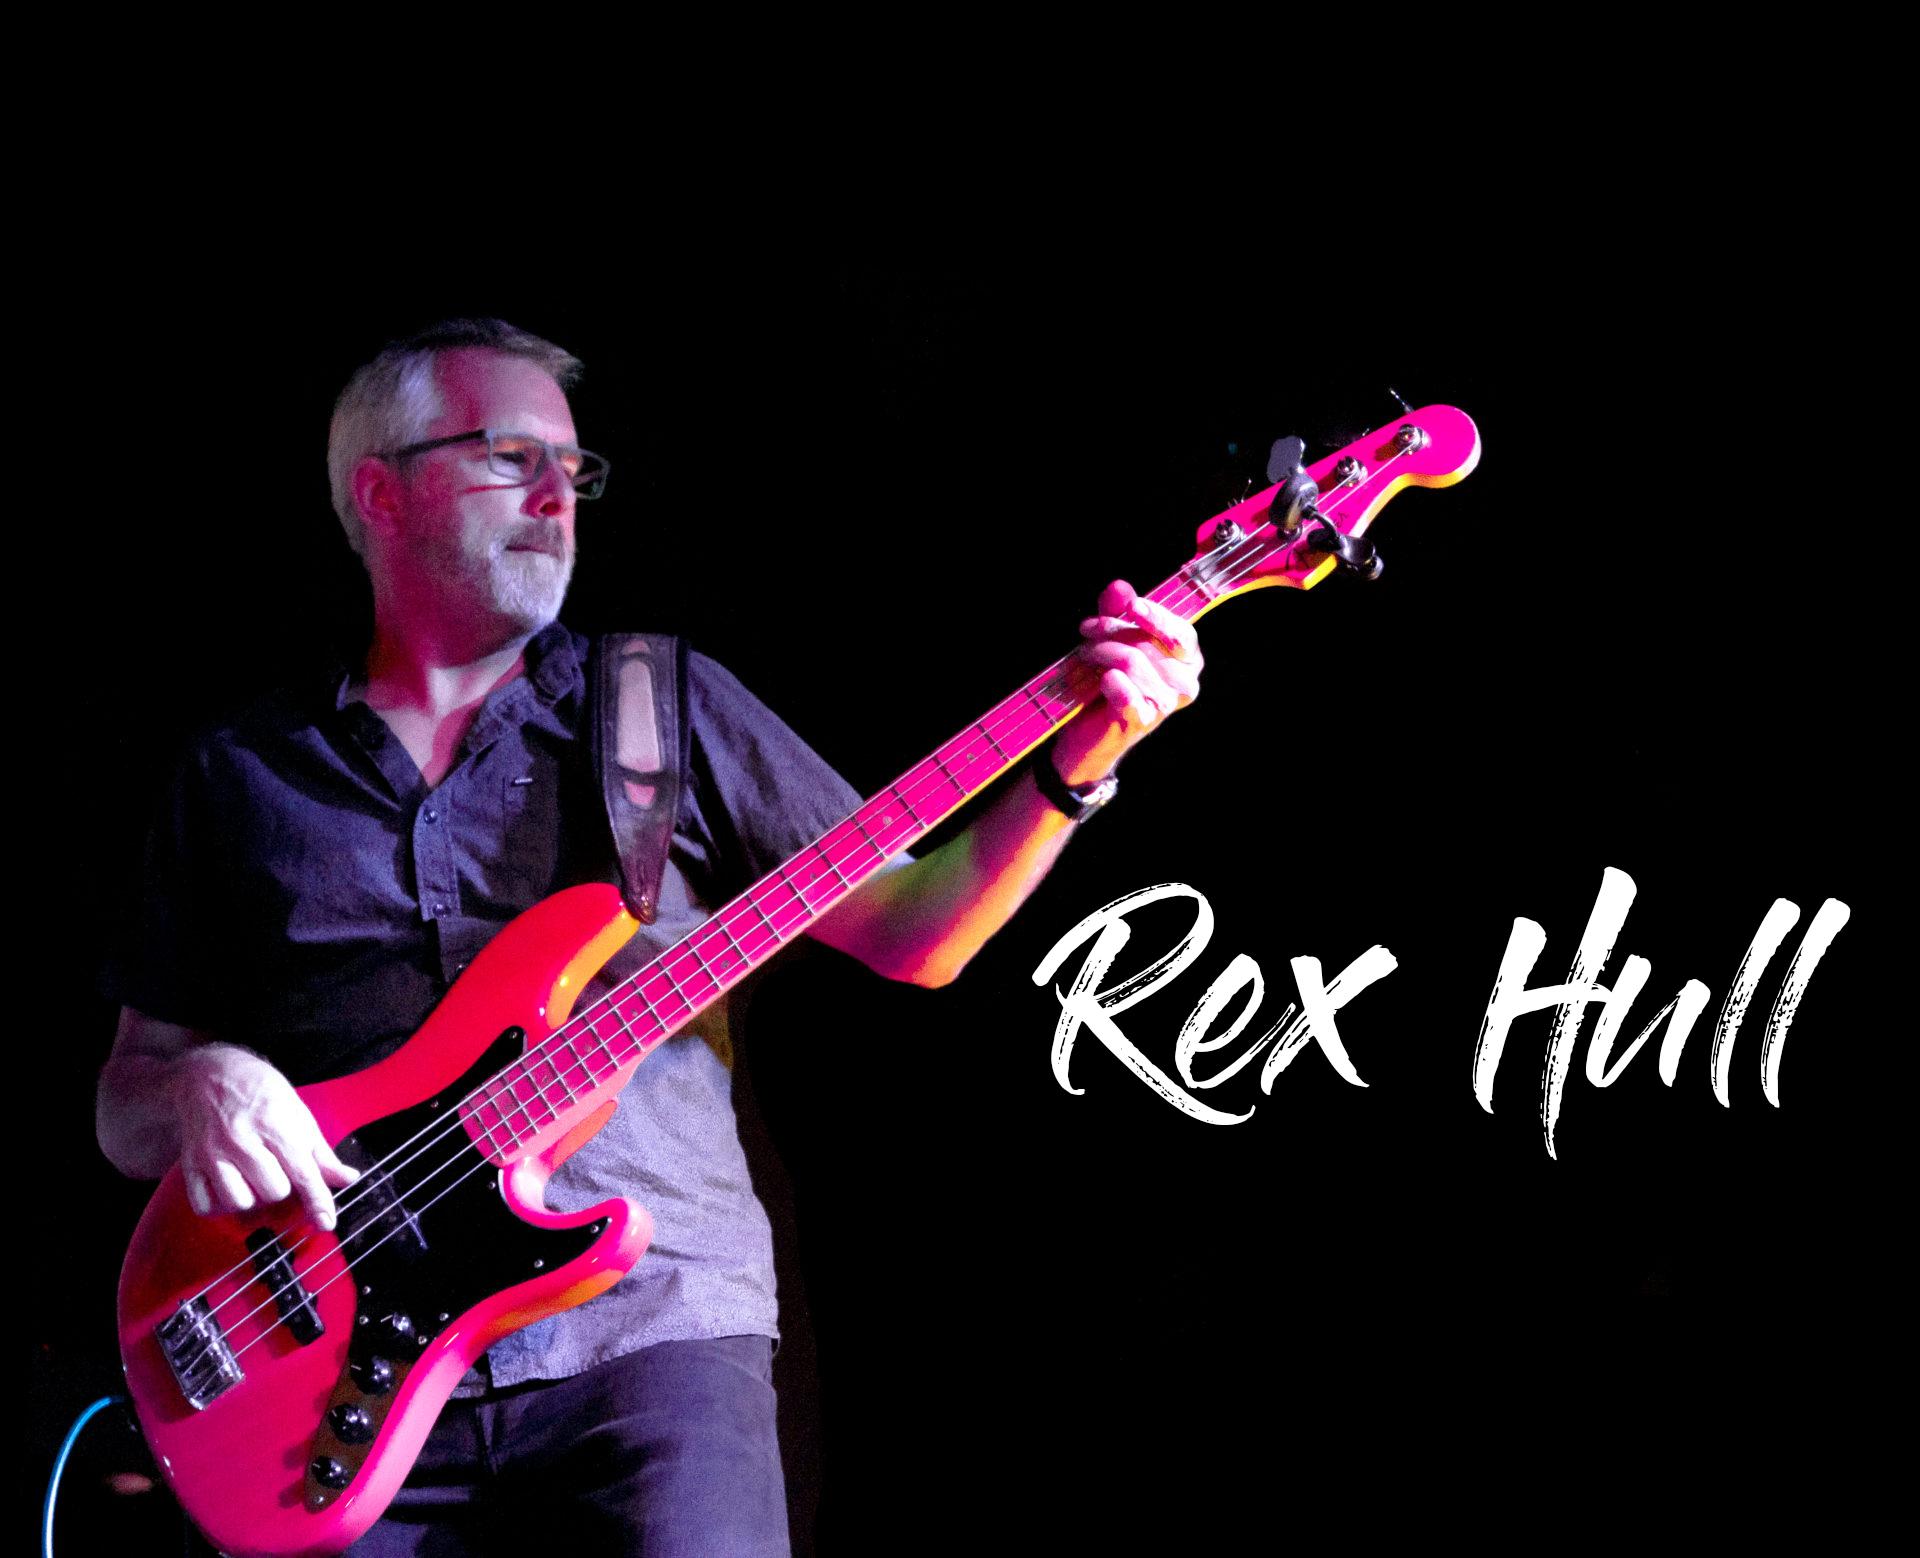 Rex Hull FB